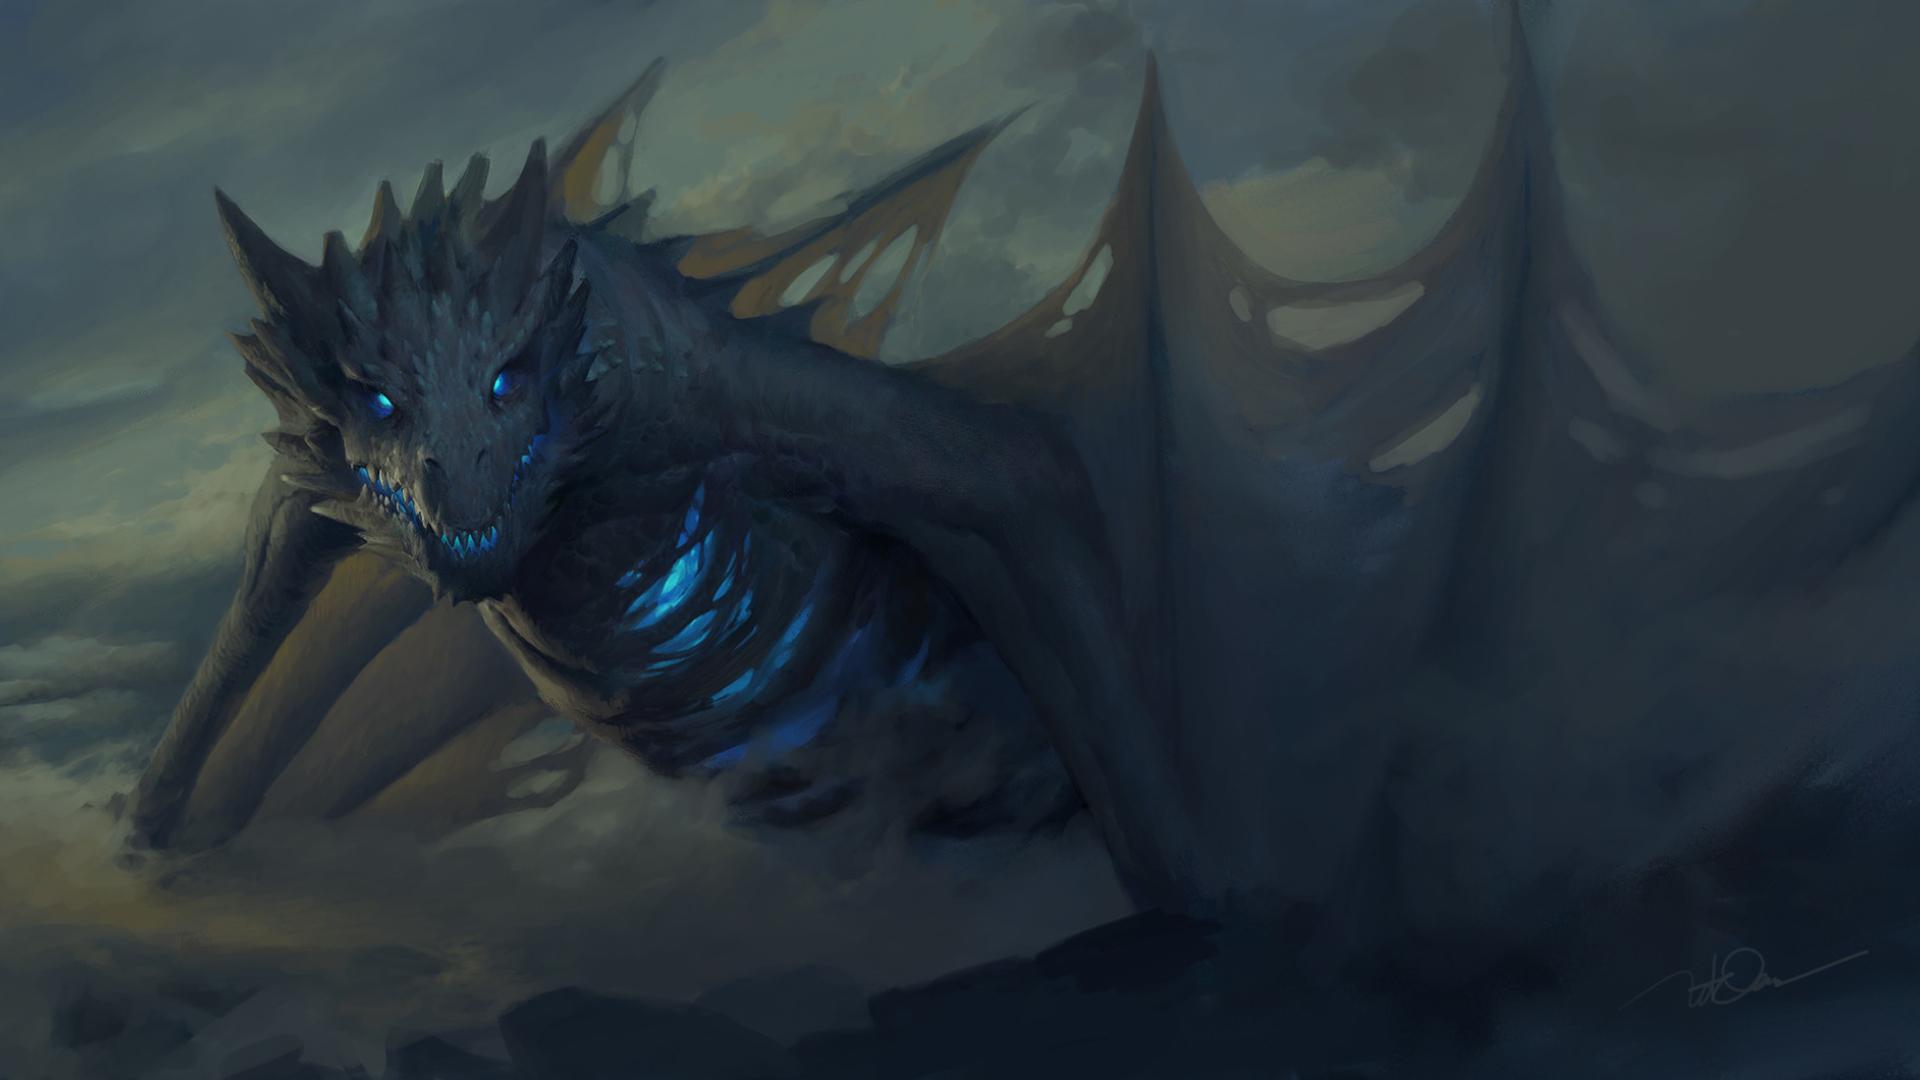 Ice Dragon Game Of Thrones 7 Full HD Wallpaper